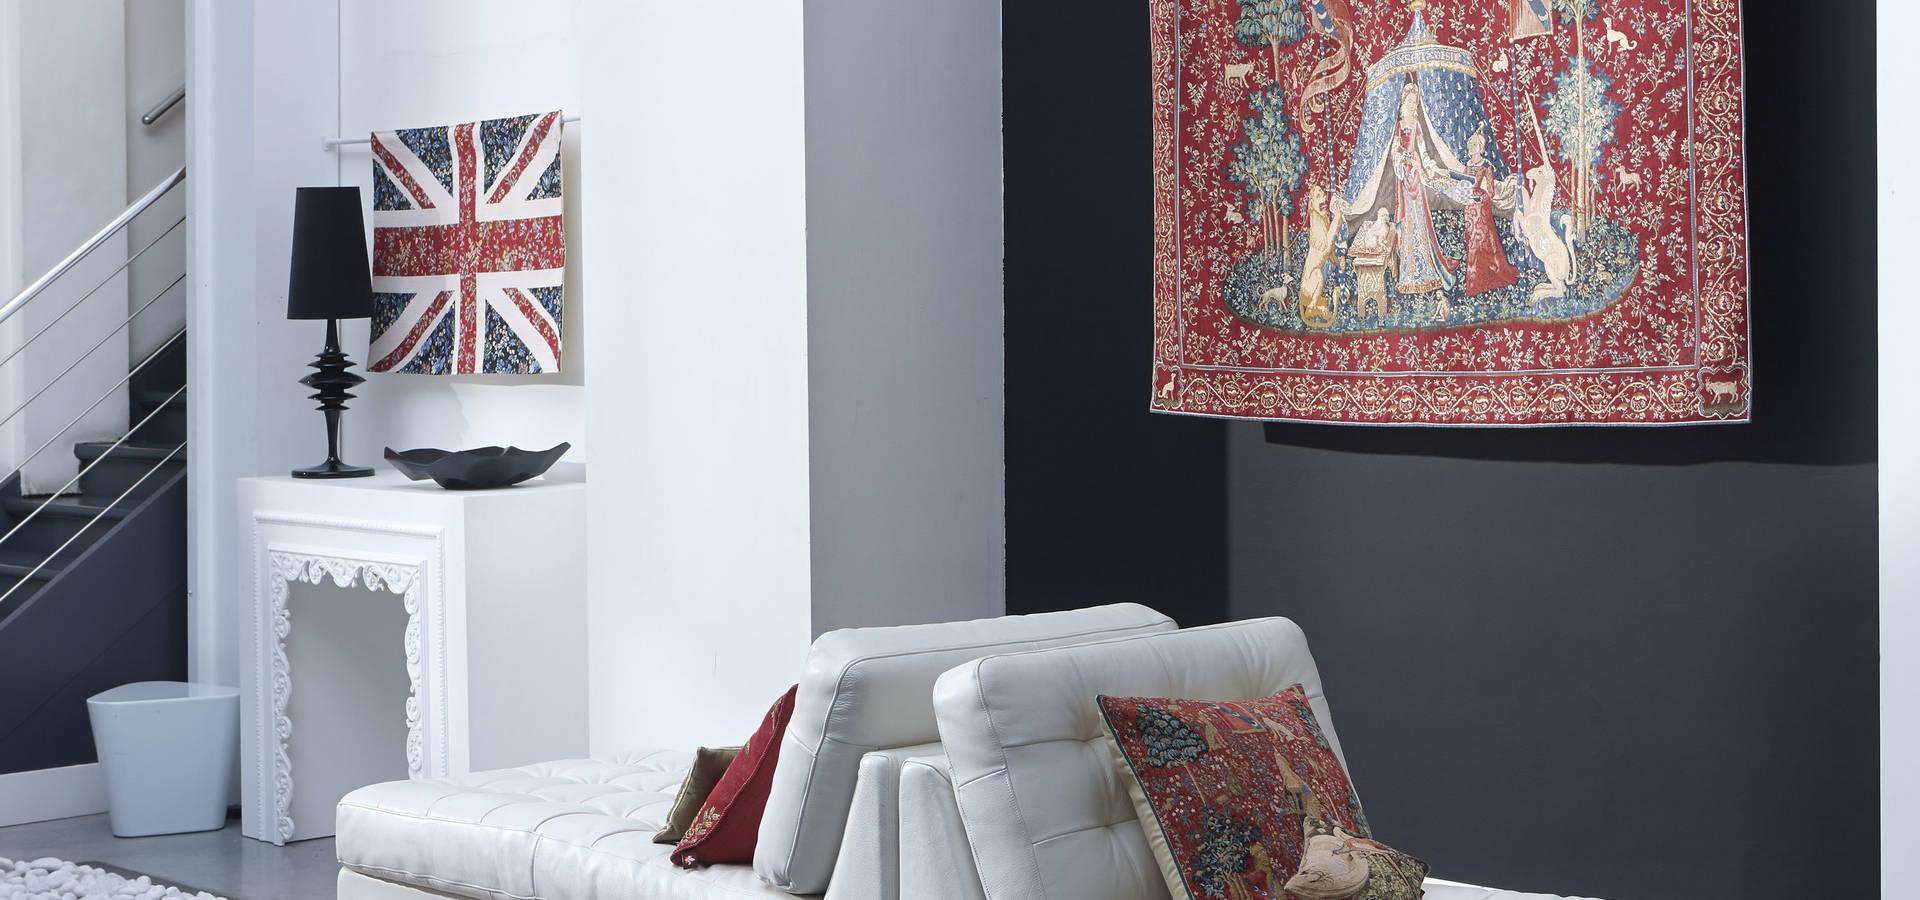 tissage art de lys textiles upholstery in lys lez lannoy homify. Black Bedroom Furniture Sets. Home Design Ideas